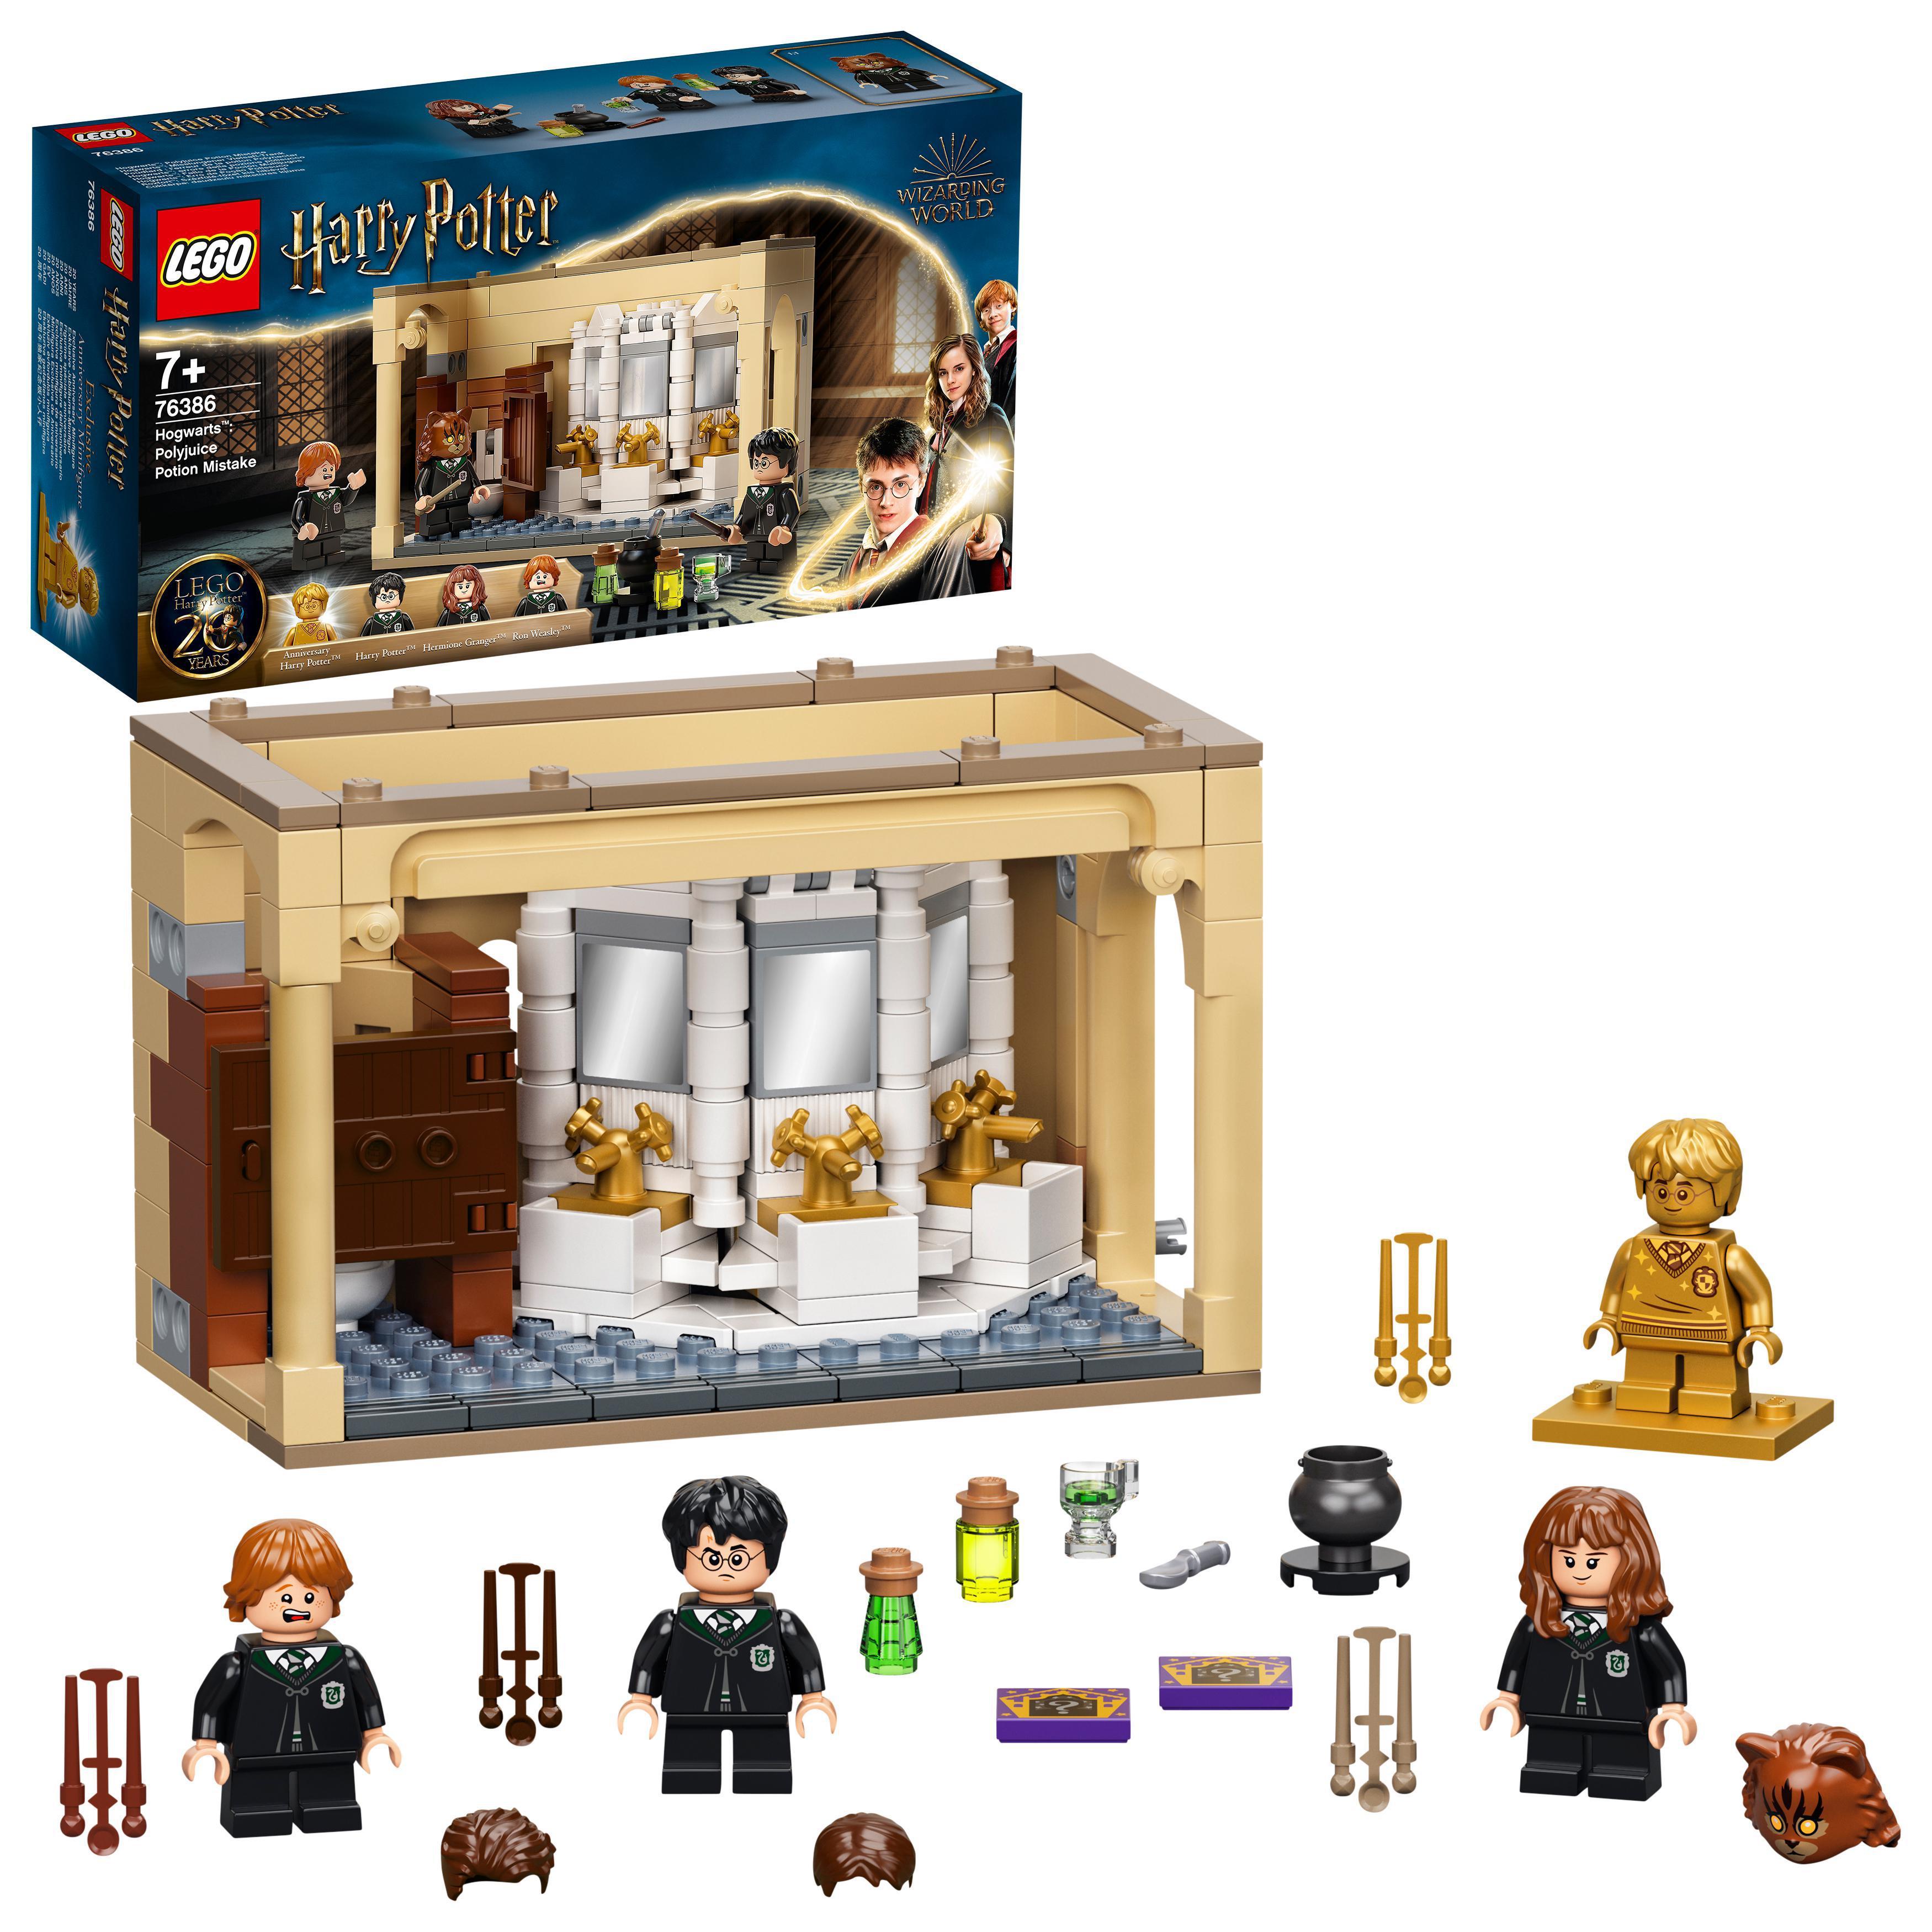 LEGO Harry Potter - Hogwarts™: Polyjuice Potion Mistake (76386)